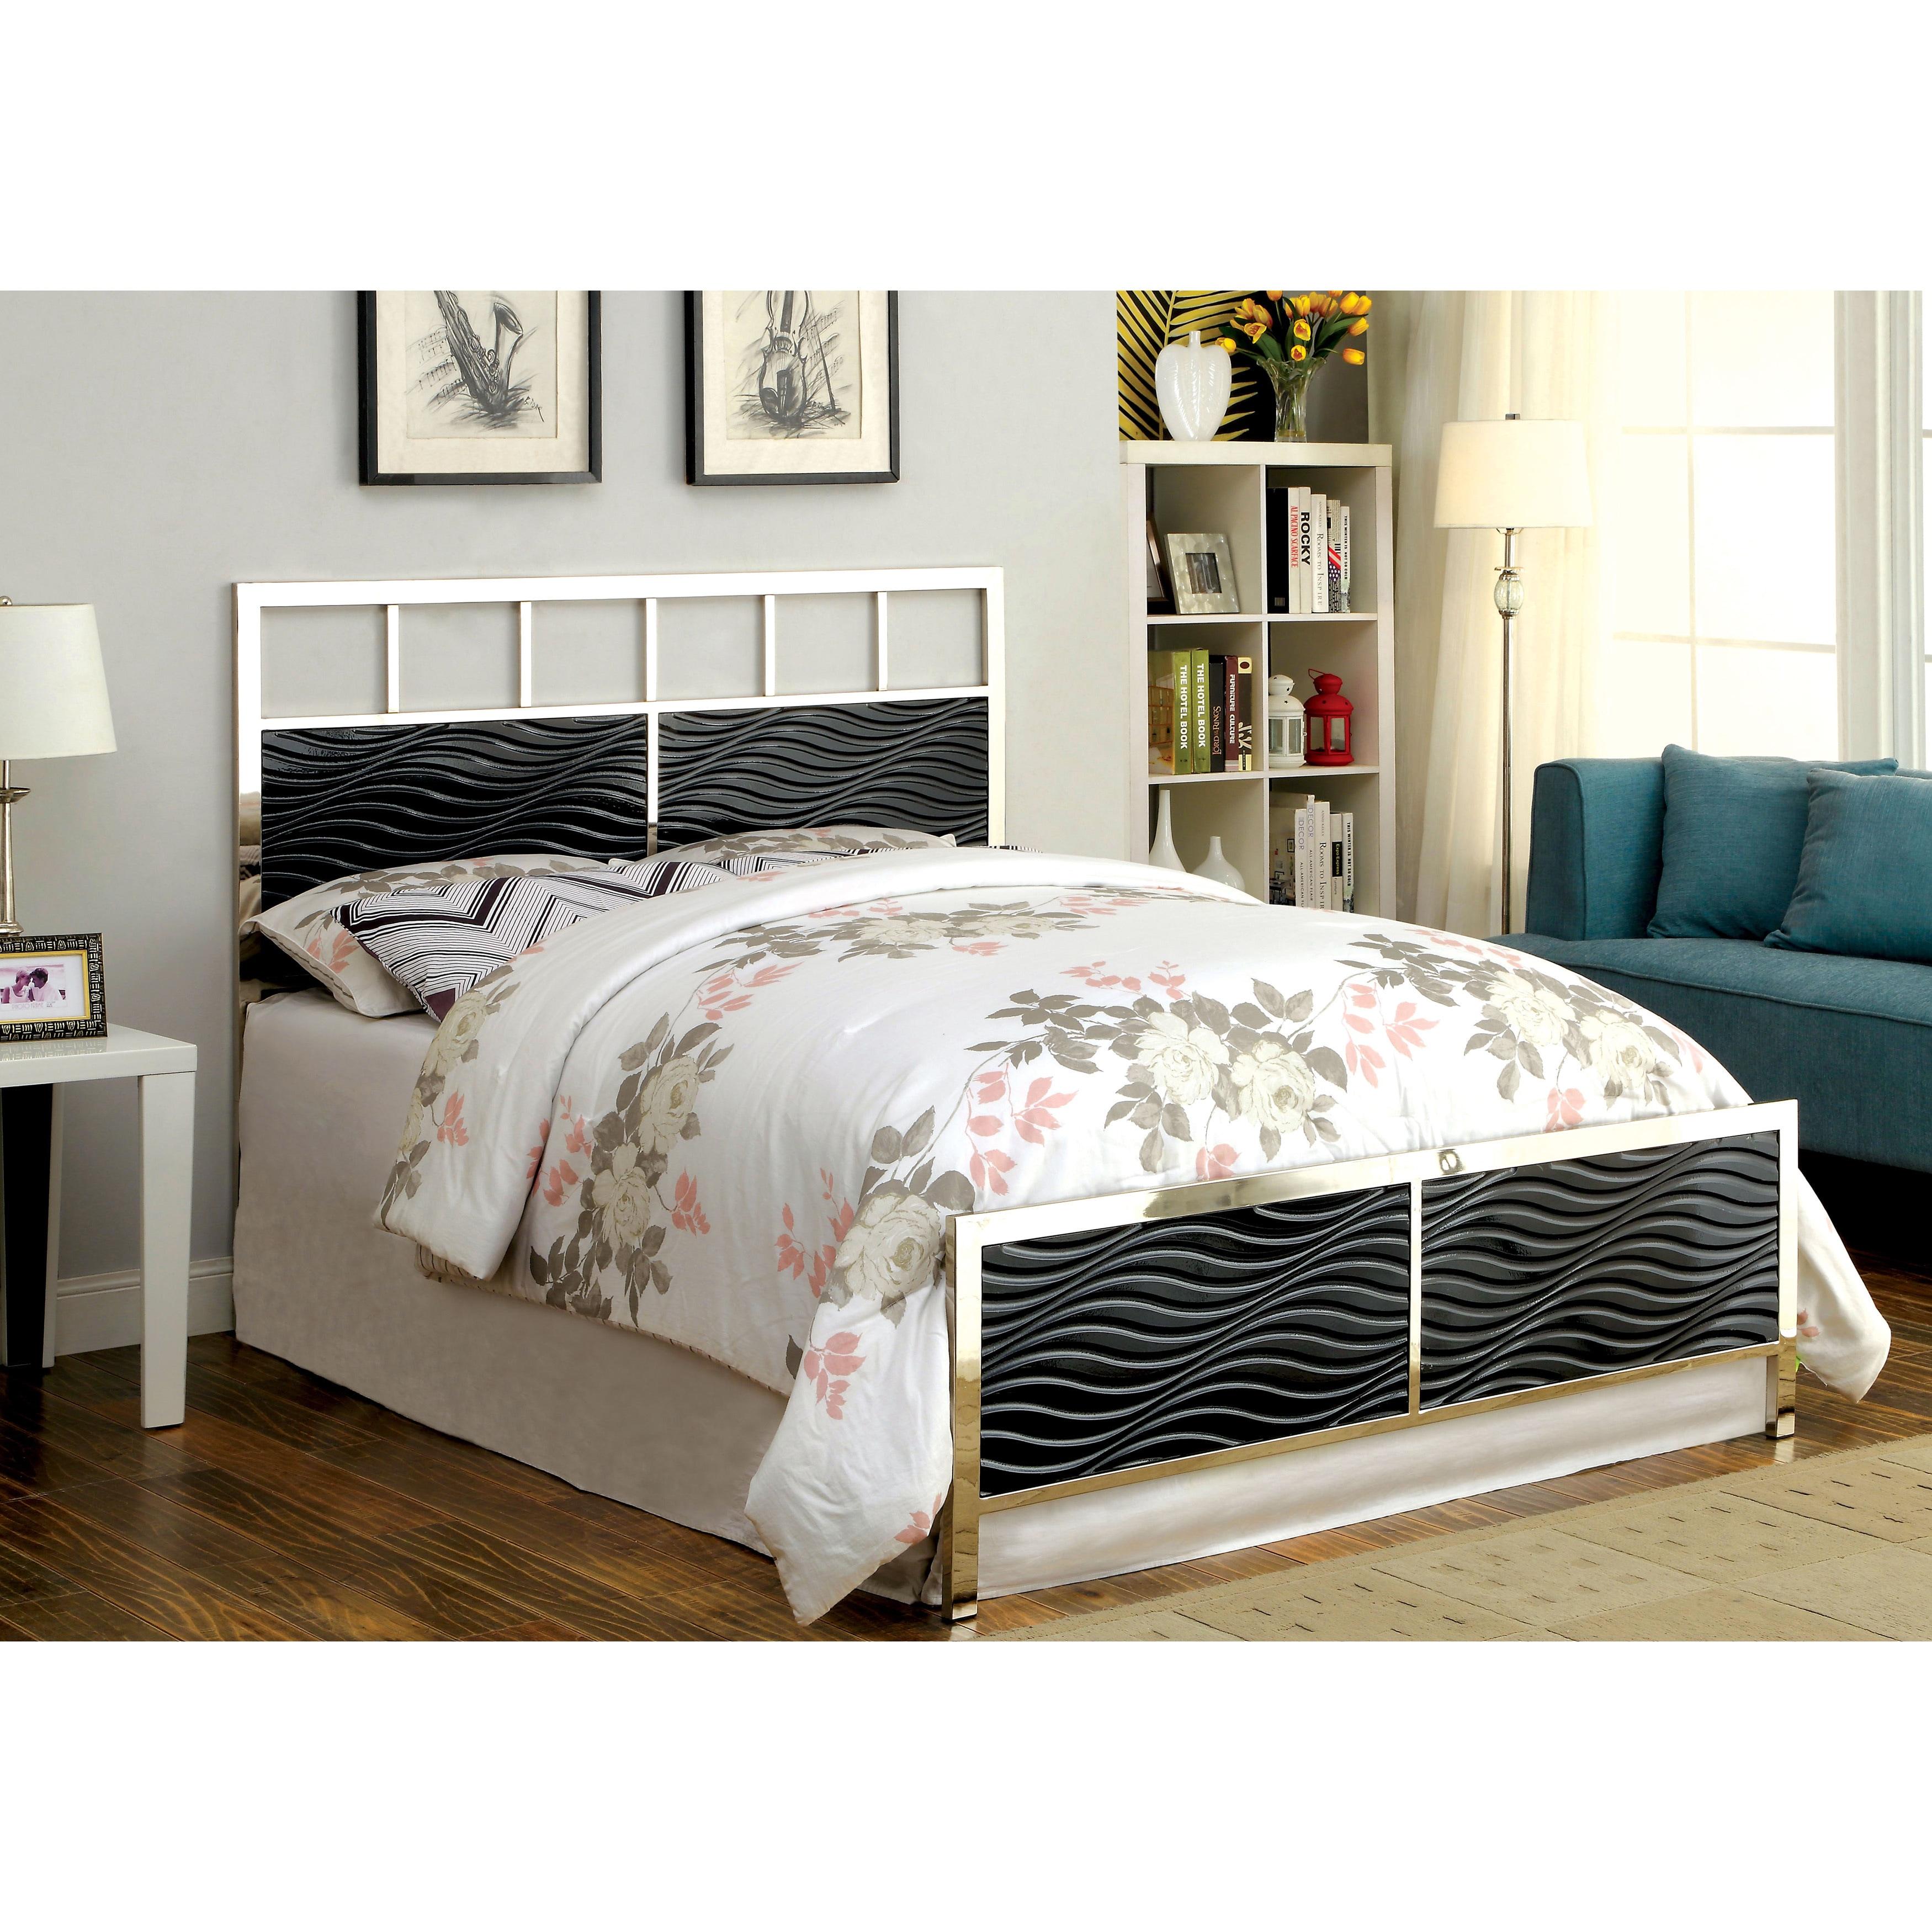 chrome bedroom furniture. Interesting Furniture Furniture Of America Hypno Metallic Bed To Chrome Bedroom Furniture F